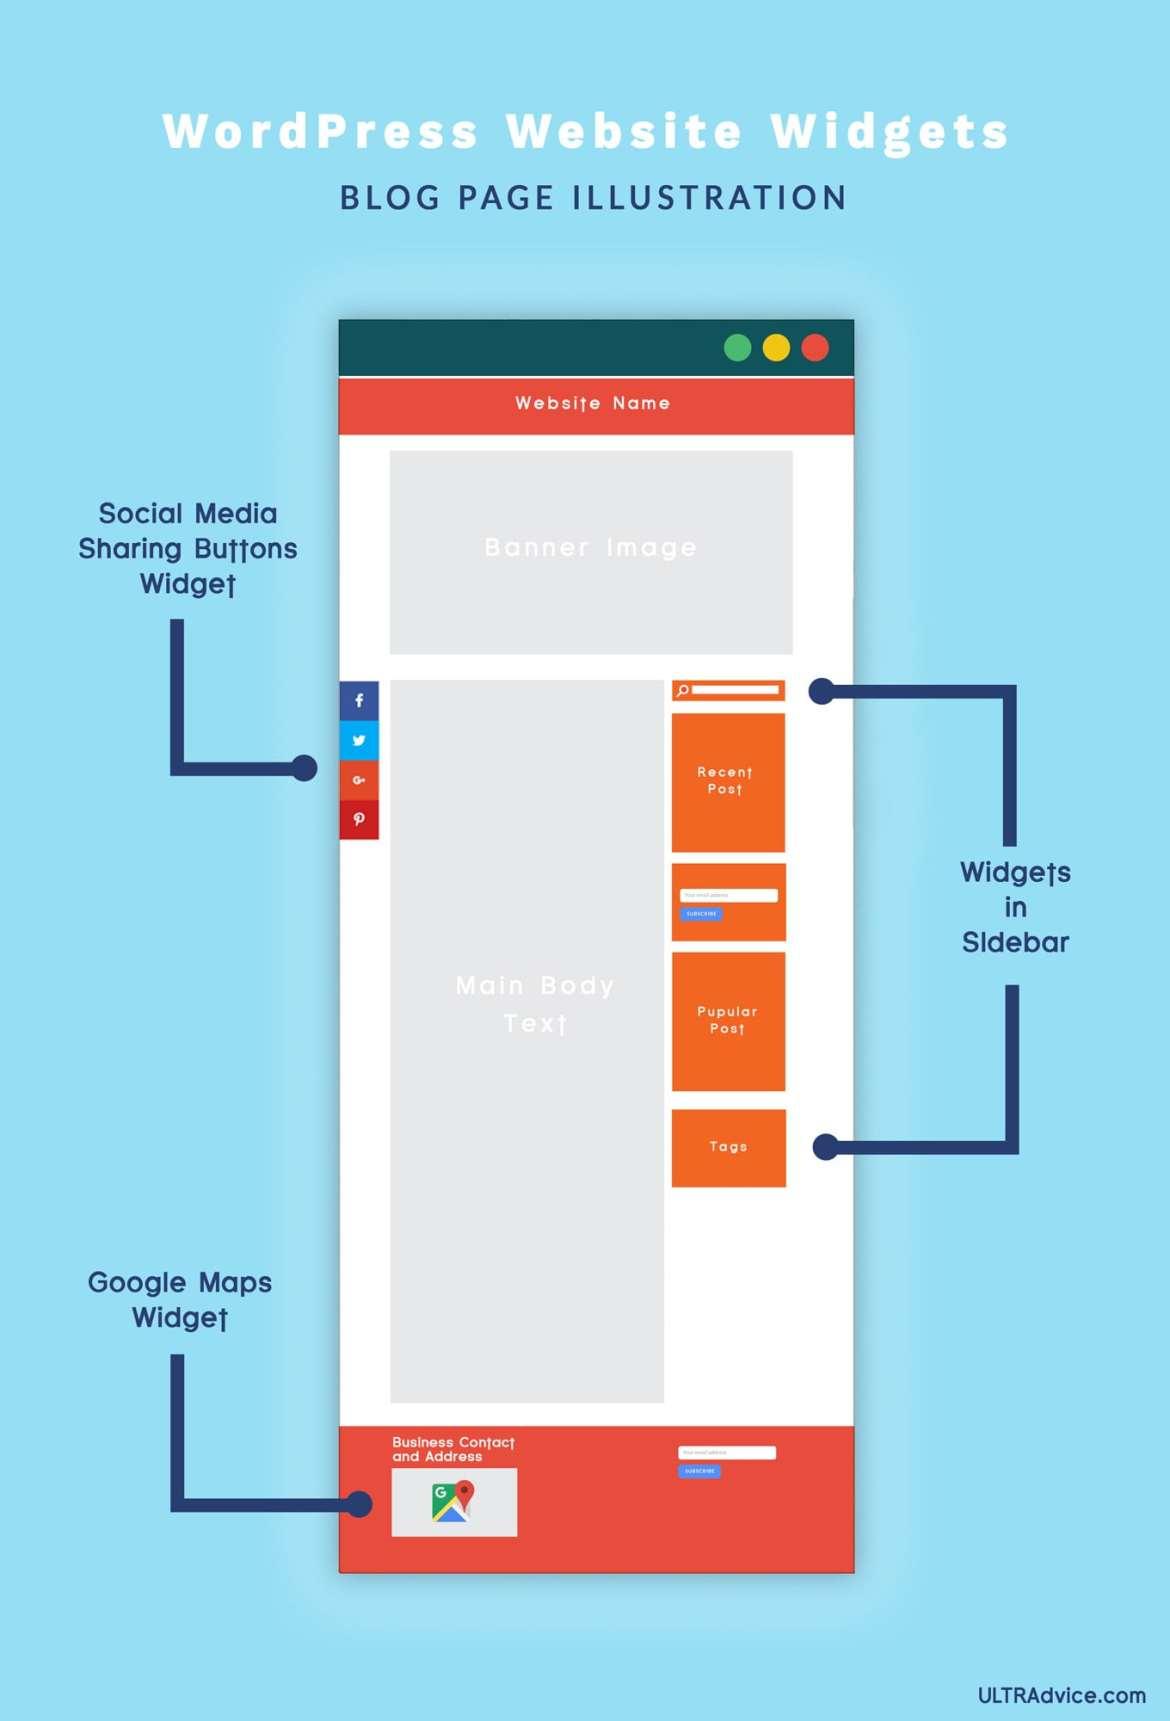 Infographics WordPress-Website-Widgets-Blog-Page-Illustration-ULTRAdvice-2